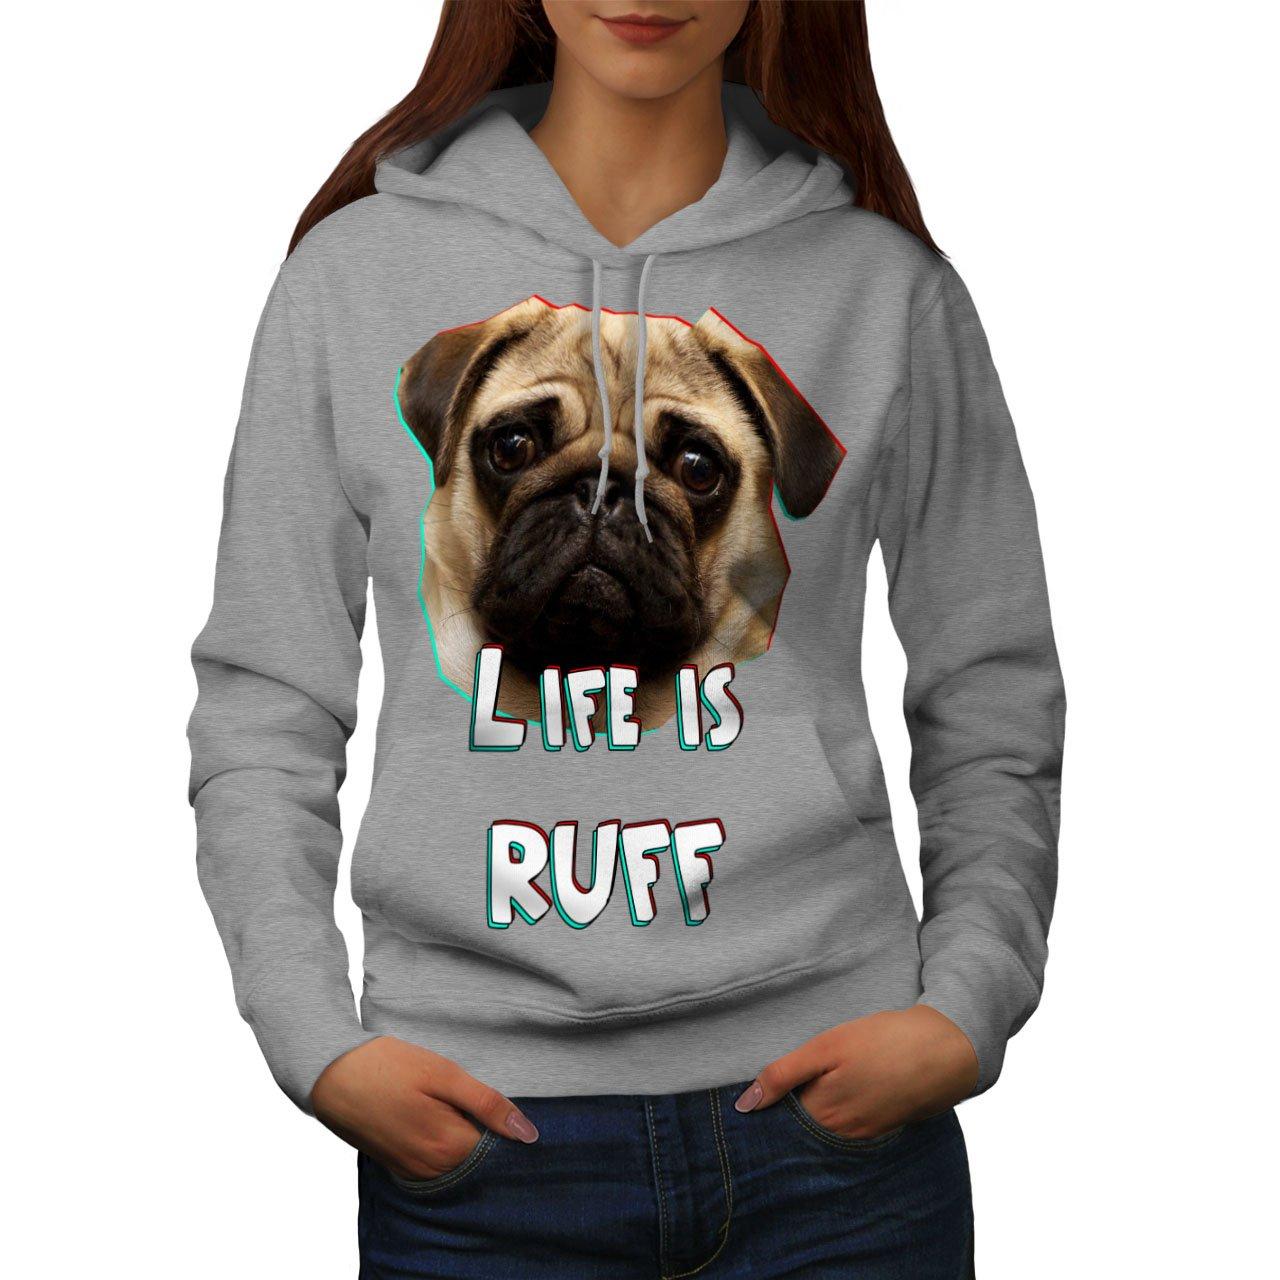 Wellcoda Pug Dog Face Look Womens Hoodie, Life Print Hooded Sweatshirt Grey S y2003xWxKxGzSx